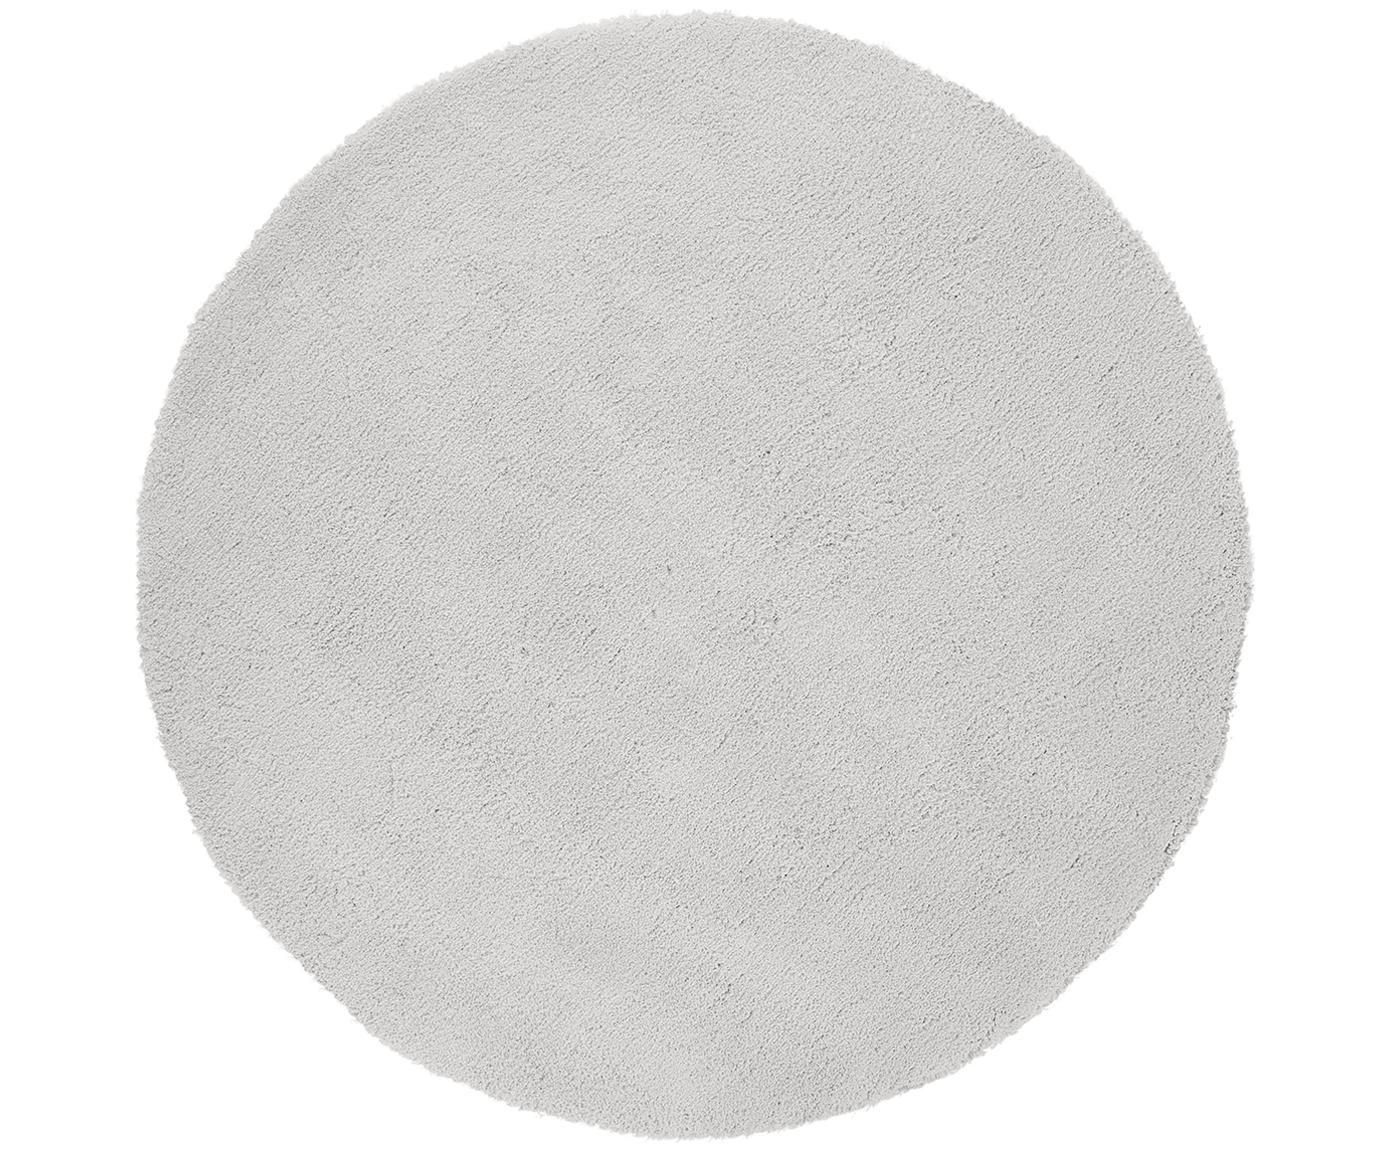 Alfombra redonda de pelo largo Leighton, Parte superior: 100%poliéster (microfibr, Reverso: 100%poliéster, Gris claro, Ø 200 cm (Tamaño L)